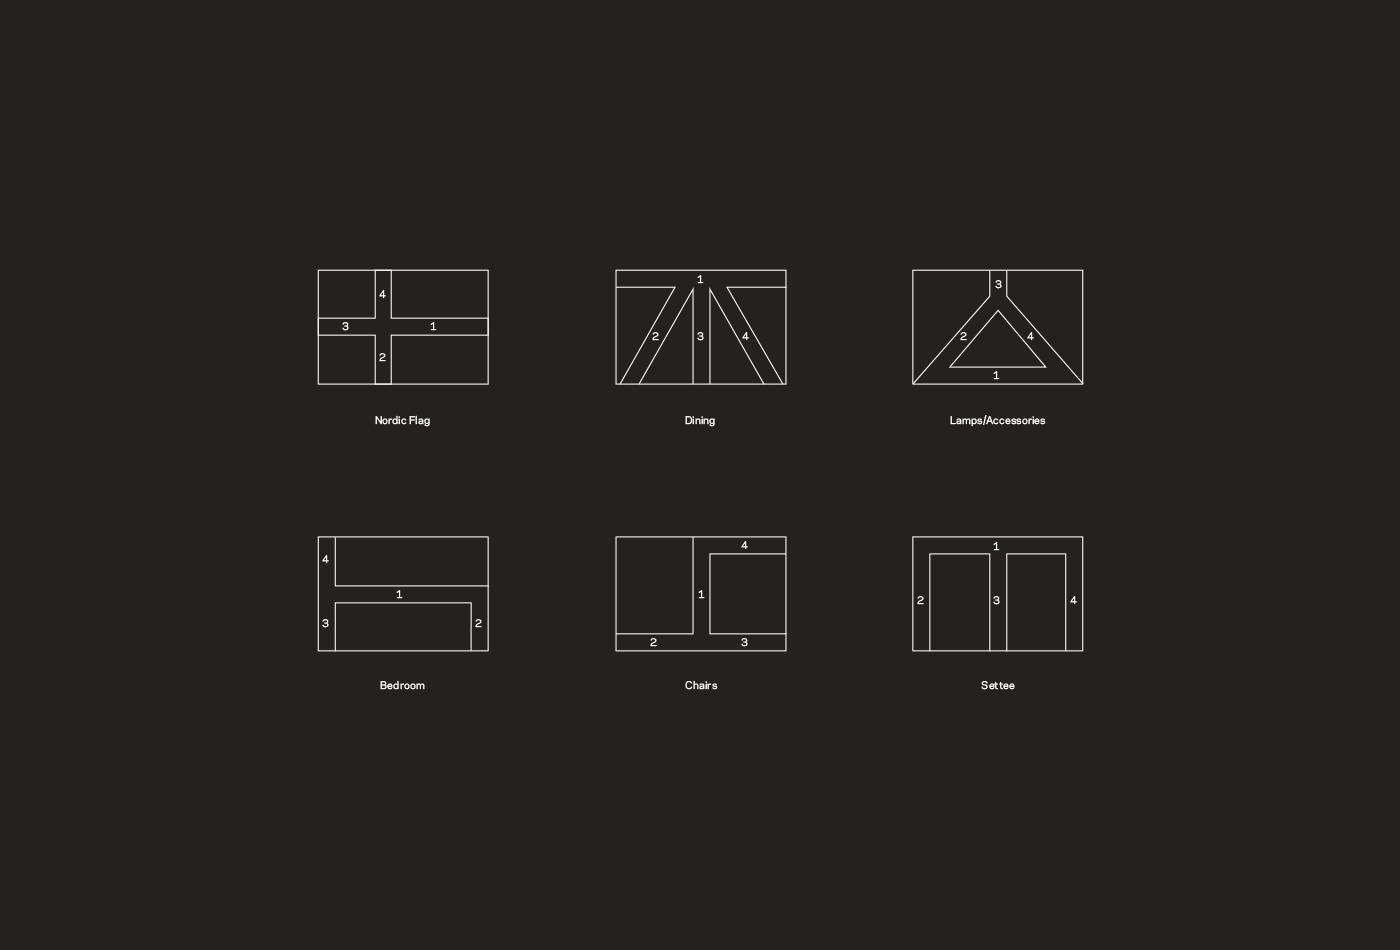 furniture Scandinavian denmark Sweden norway Stationery Business Cards catalog identity Logo Design Corporate Identity flag colorful